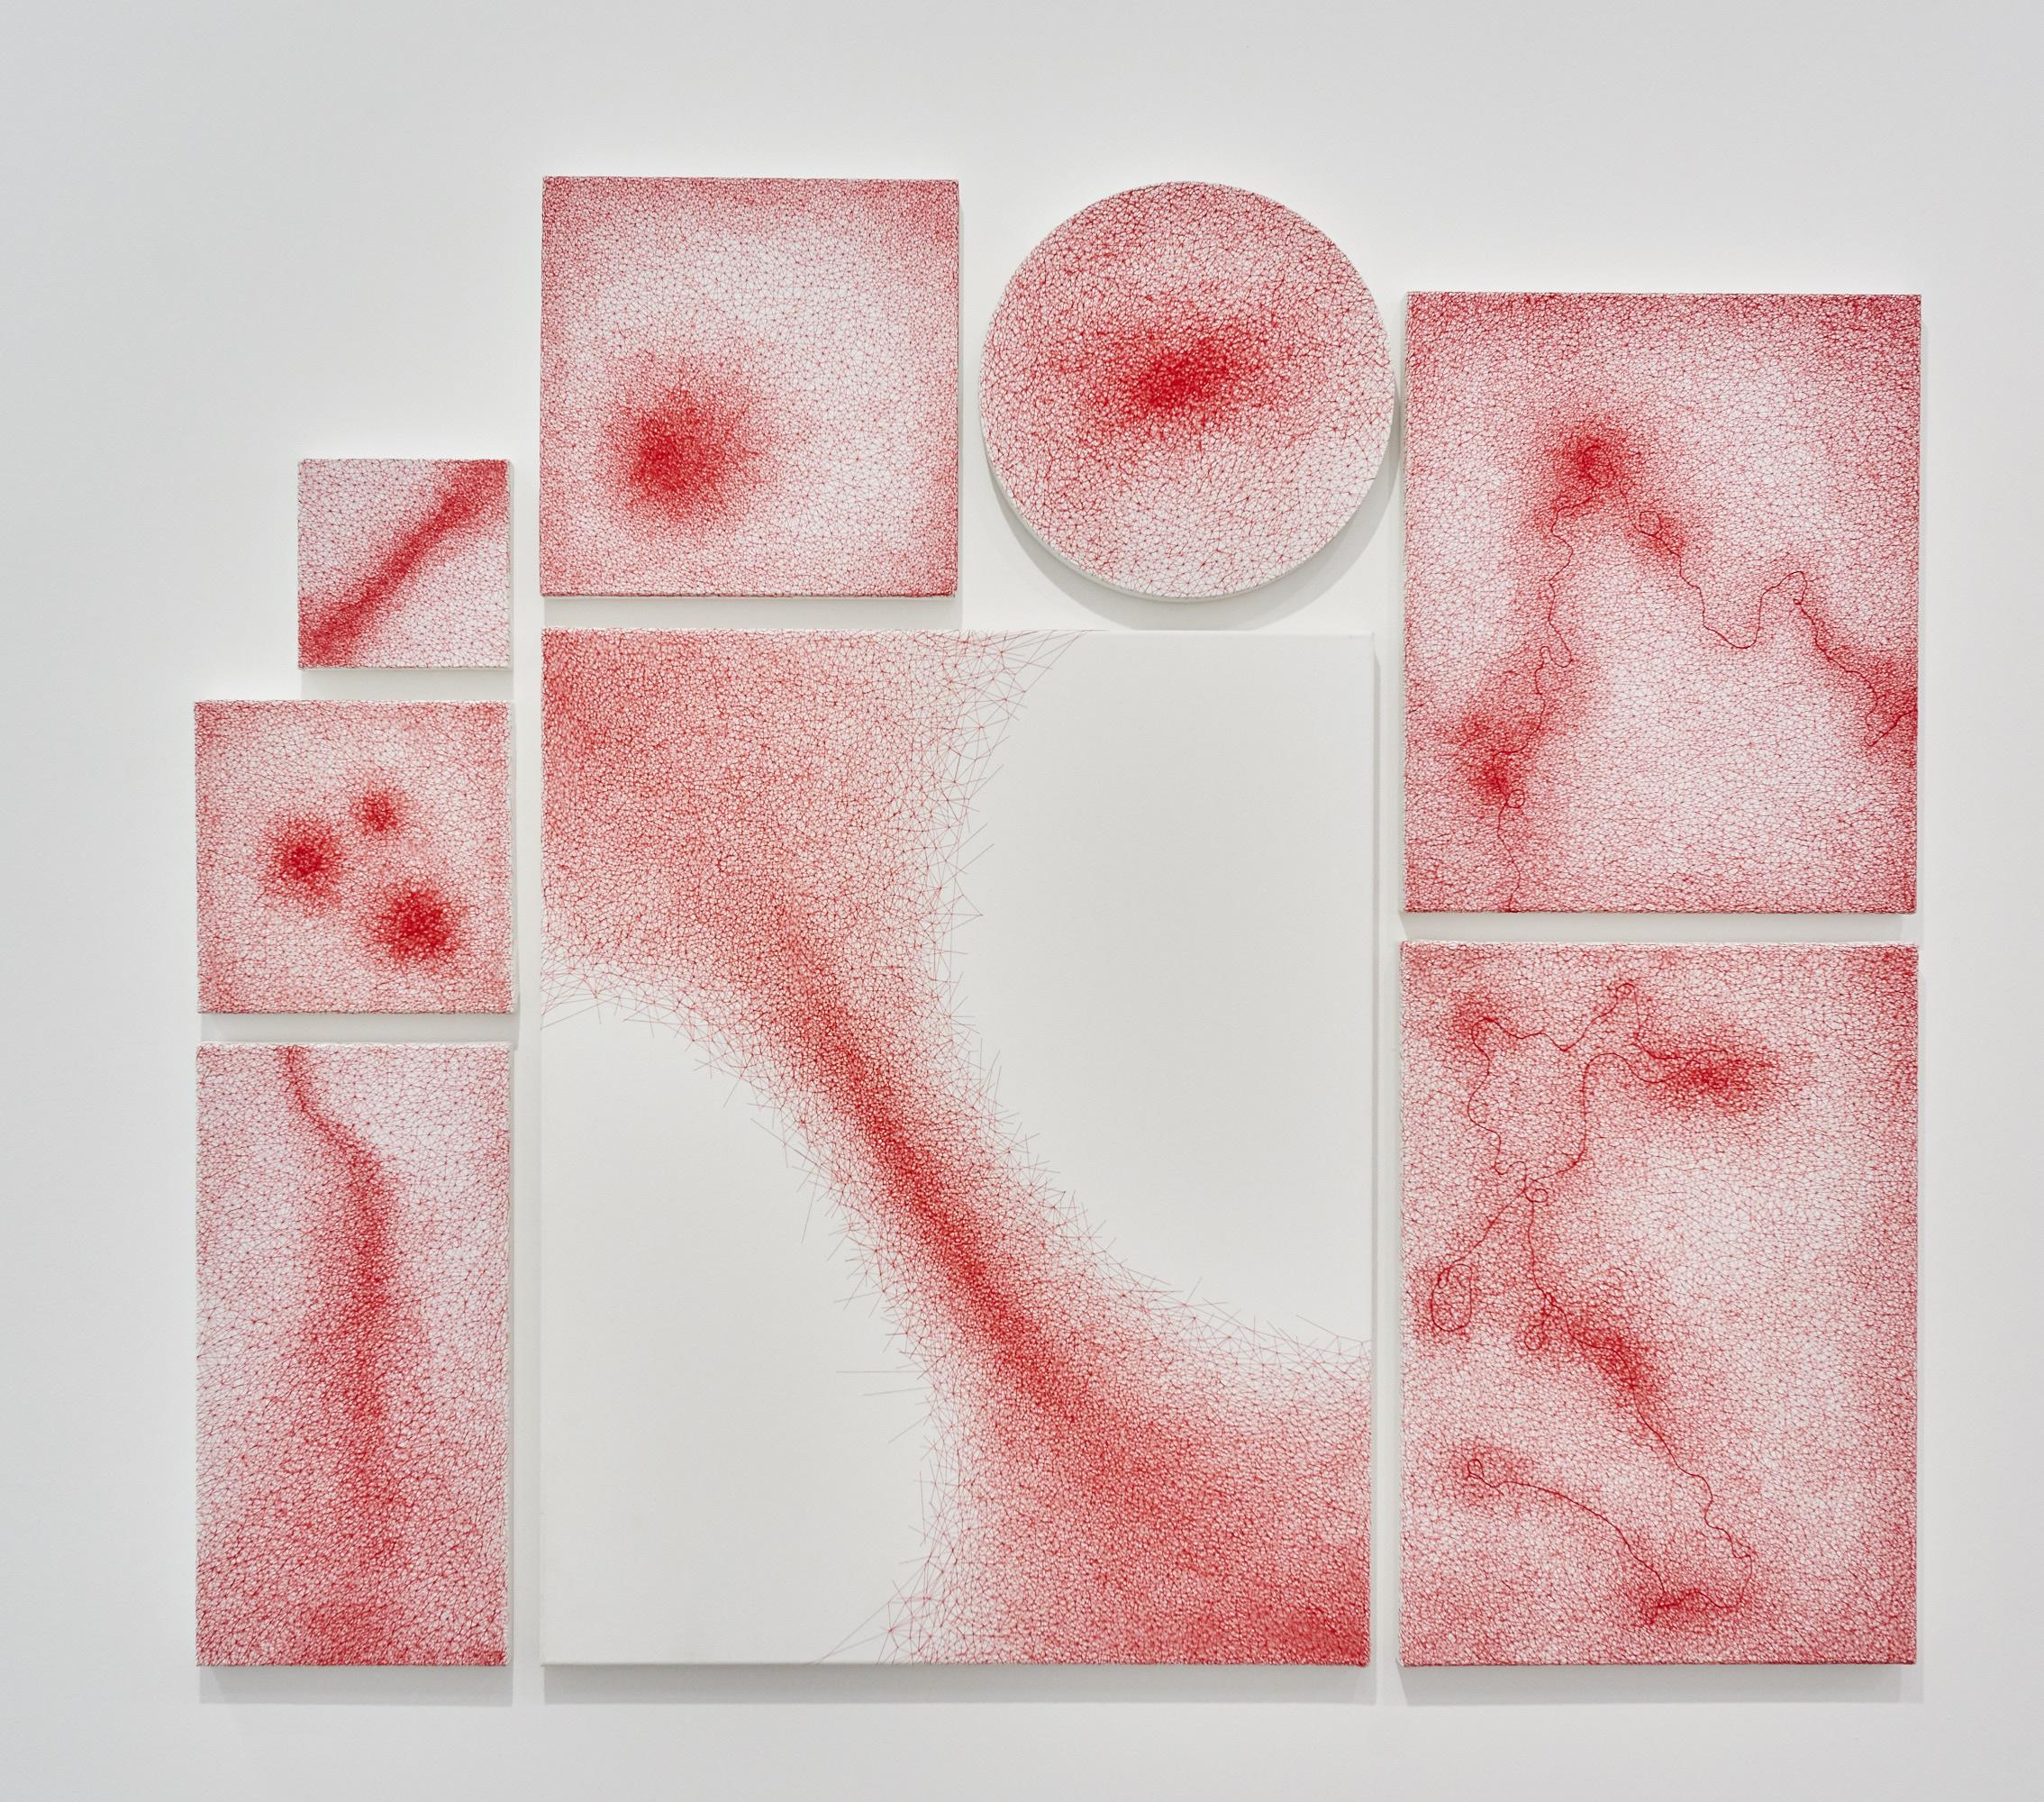 Chiharu Shiota at BlainSouthern für ArtBerlin 0092